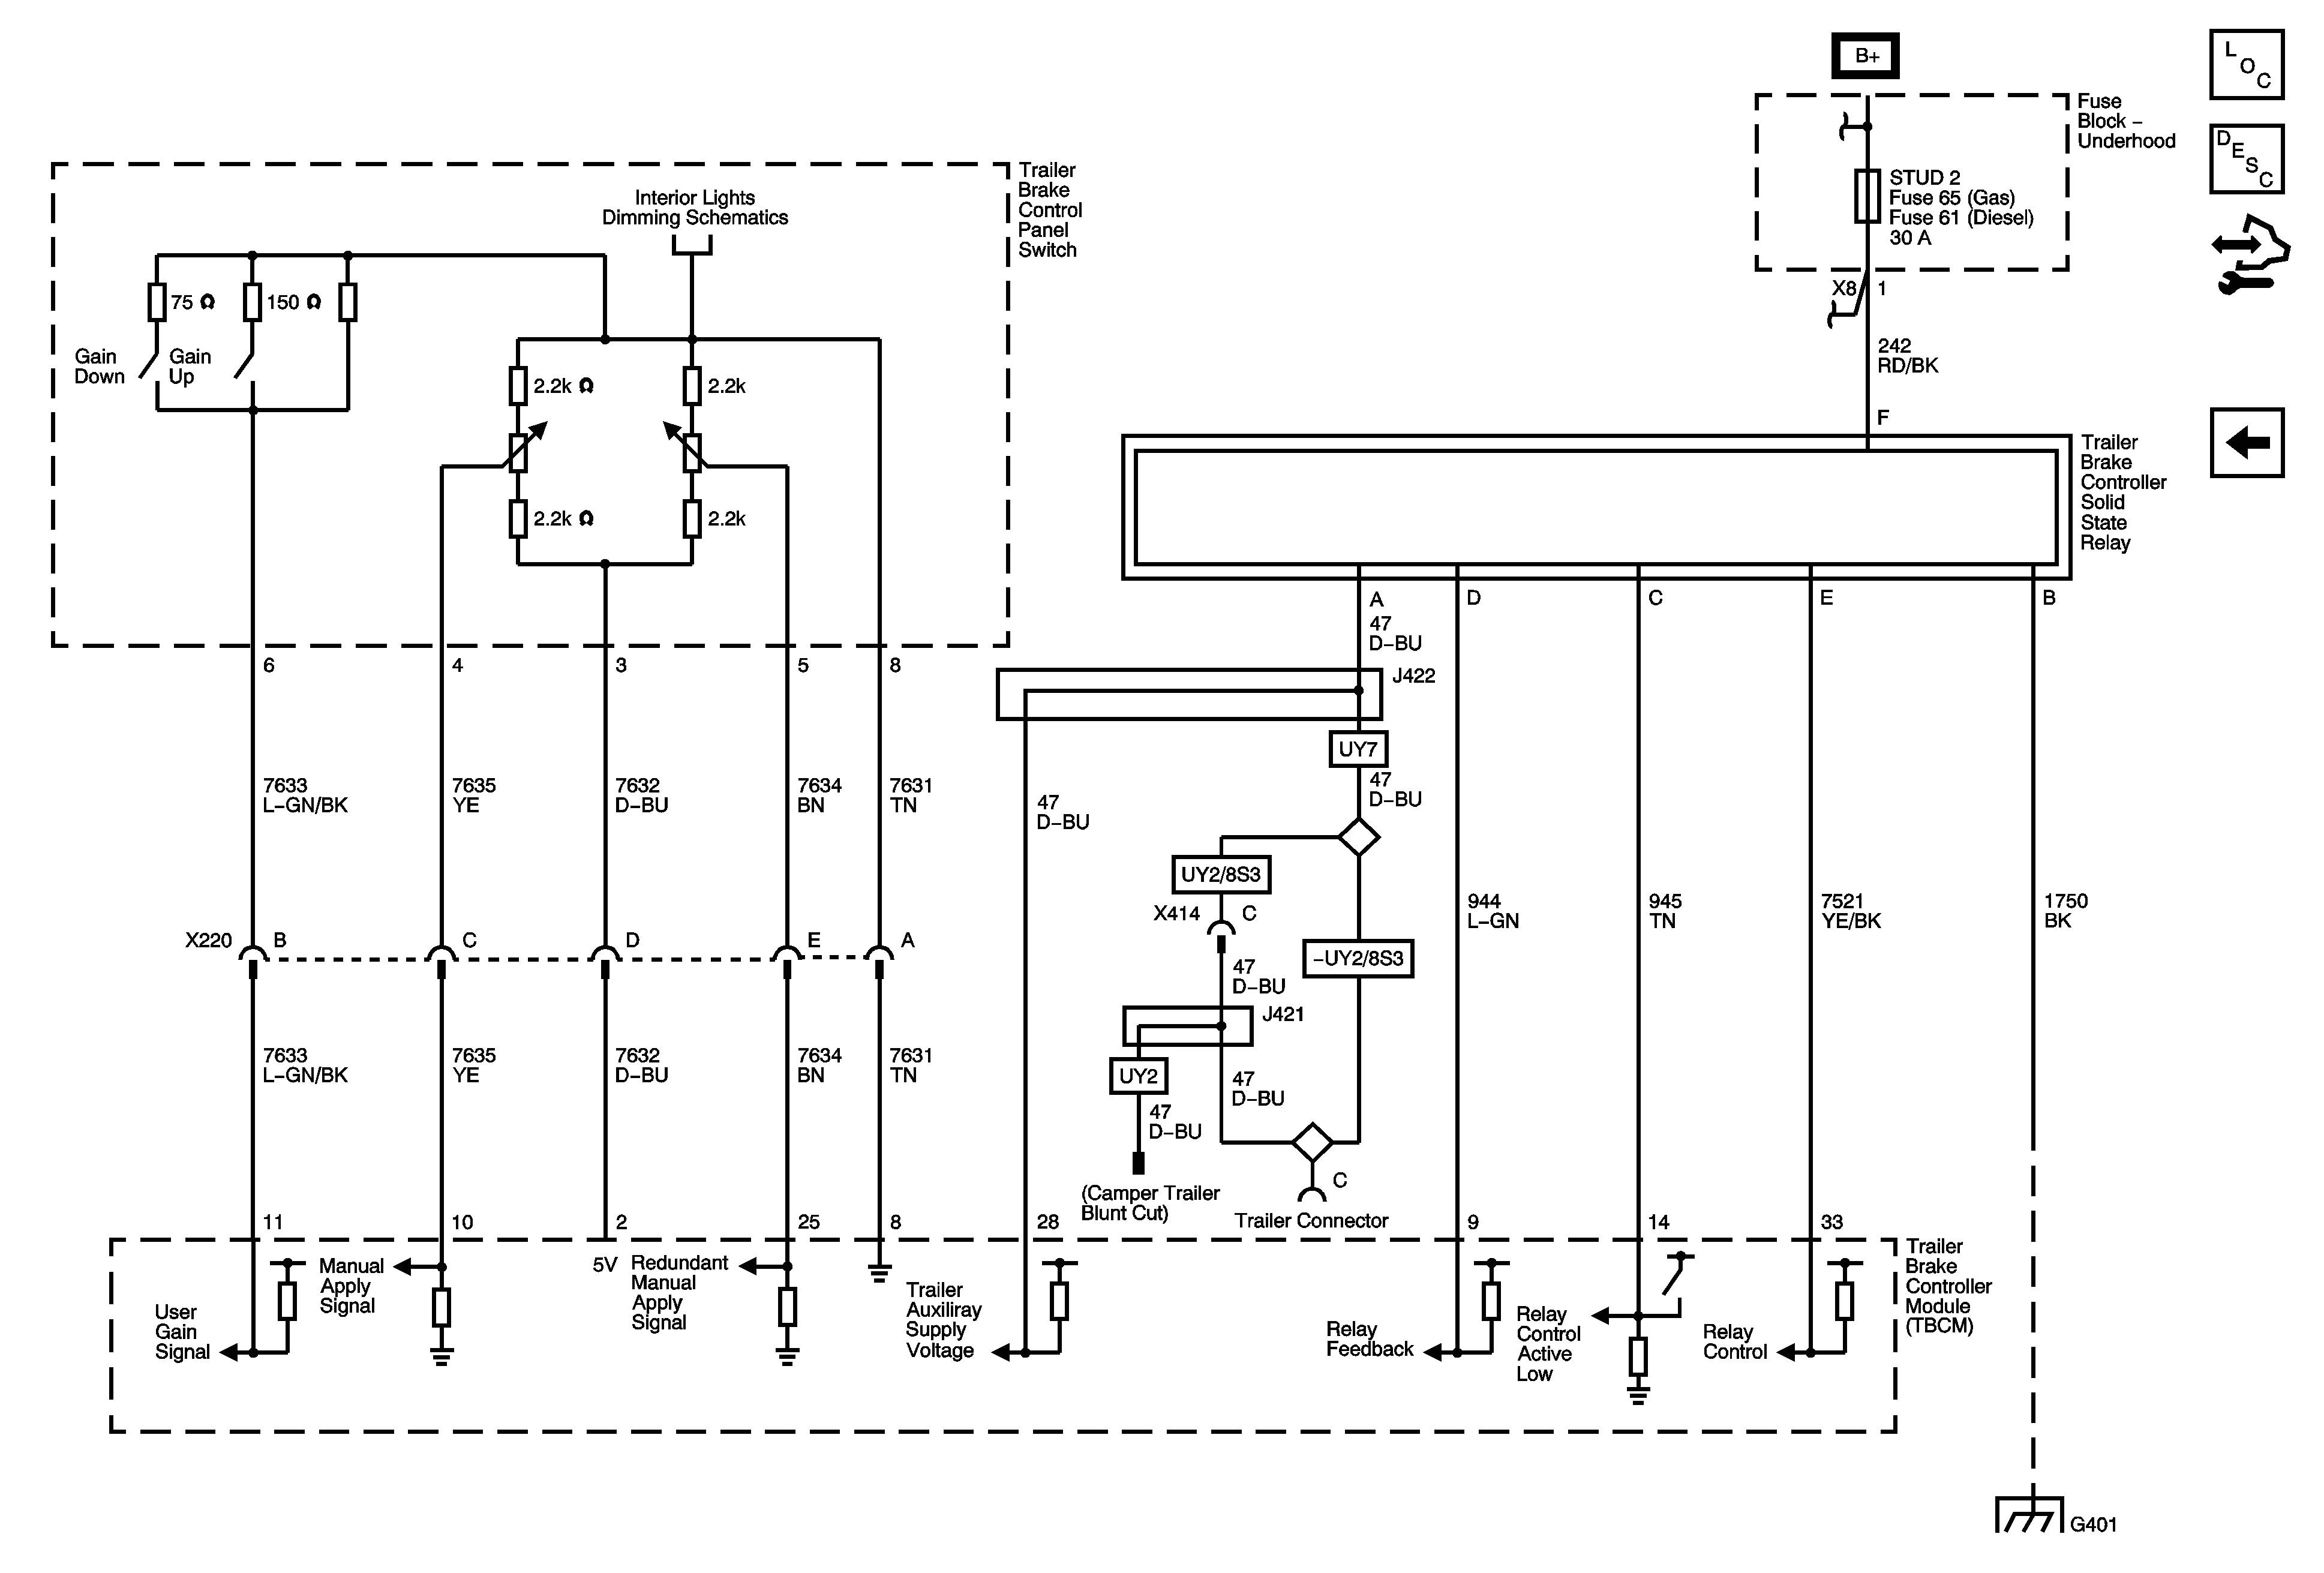 2011 dodge ram 1500 trailer wiring diagram new 2011 gmc trailer wiring diagram wiring diagram database of 2011 dodge ram 1500 trailer wiring diagram for gmc trailer wiring diagram png